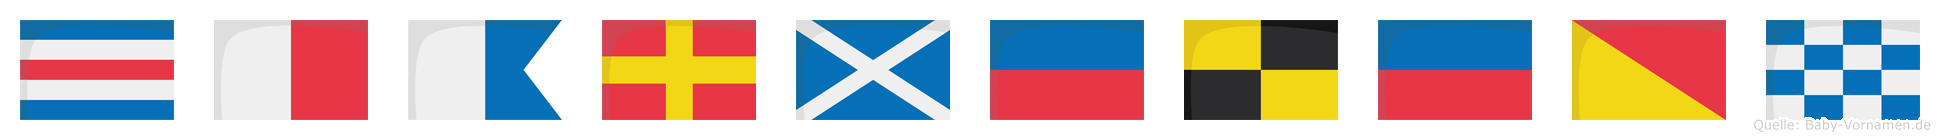 Charmeleon im Flaggenalphabet